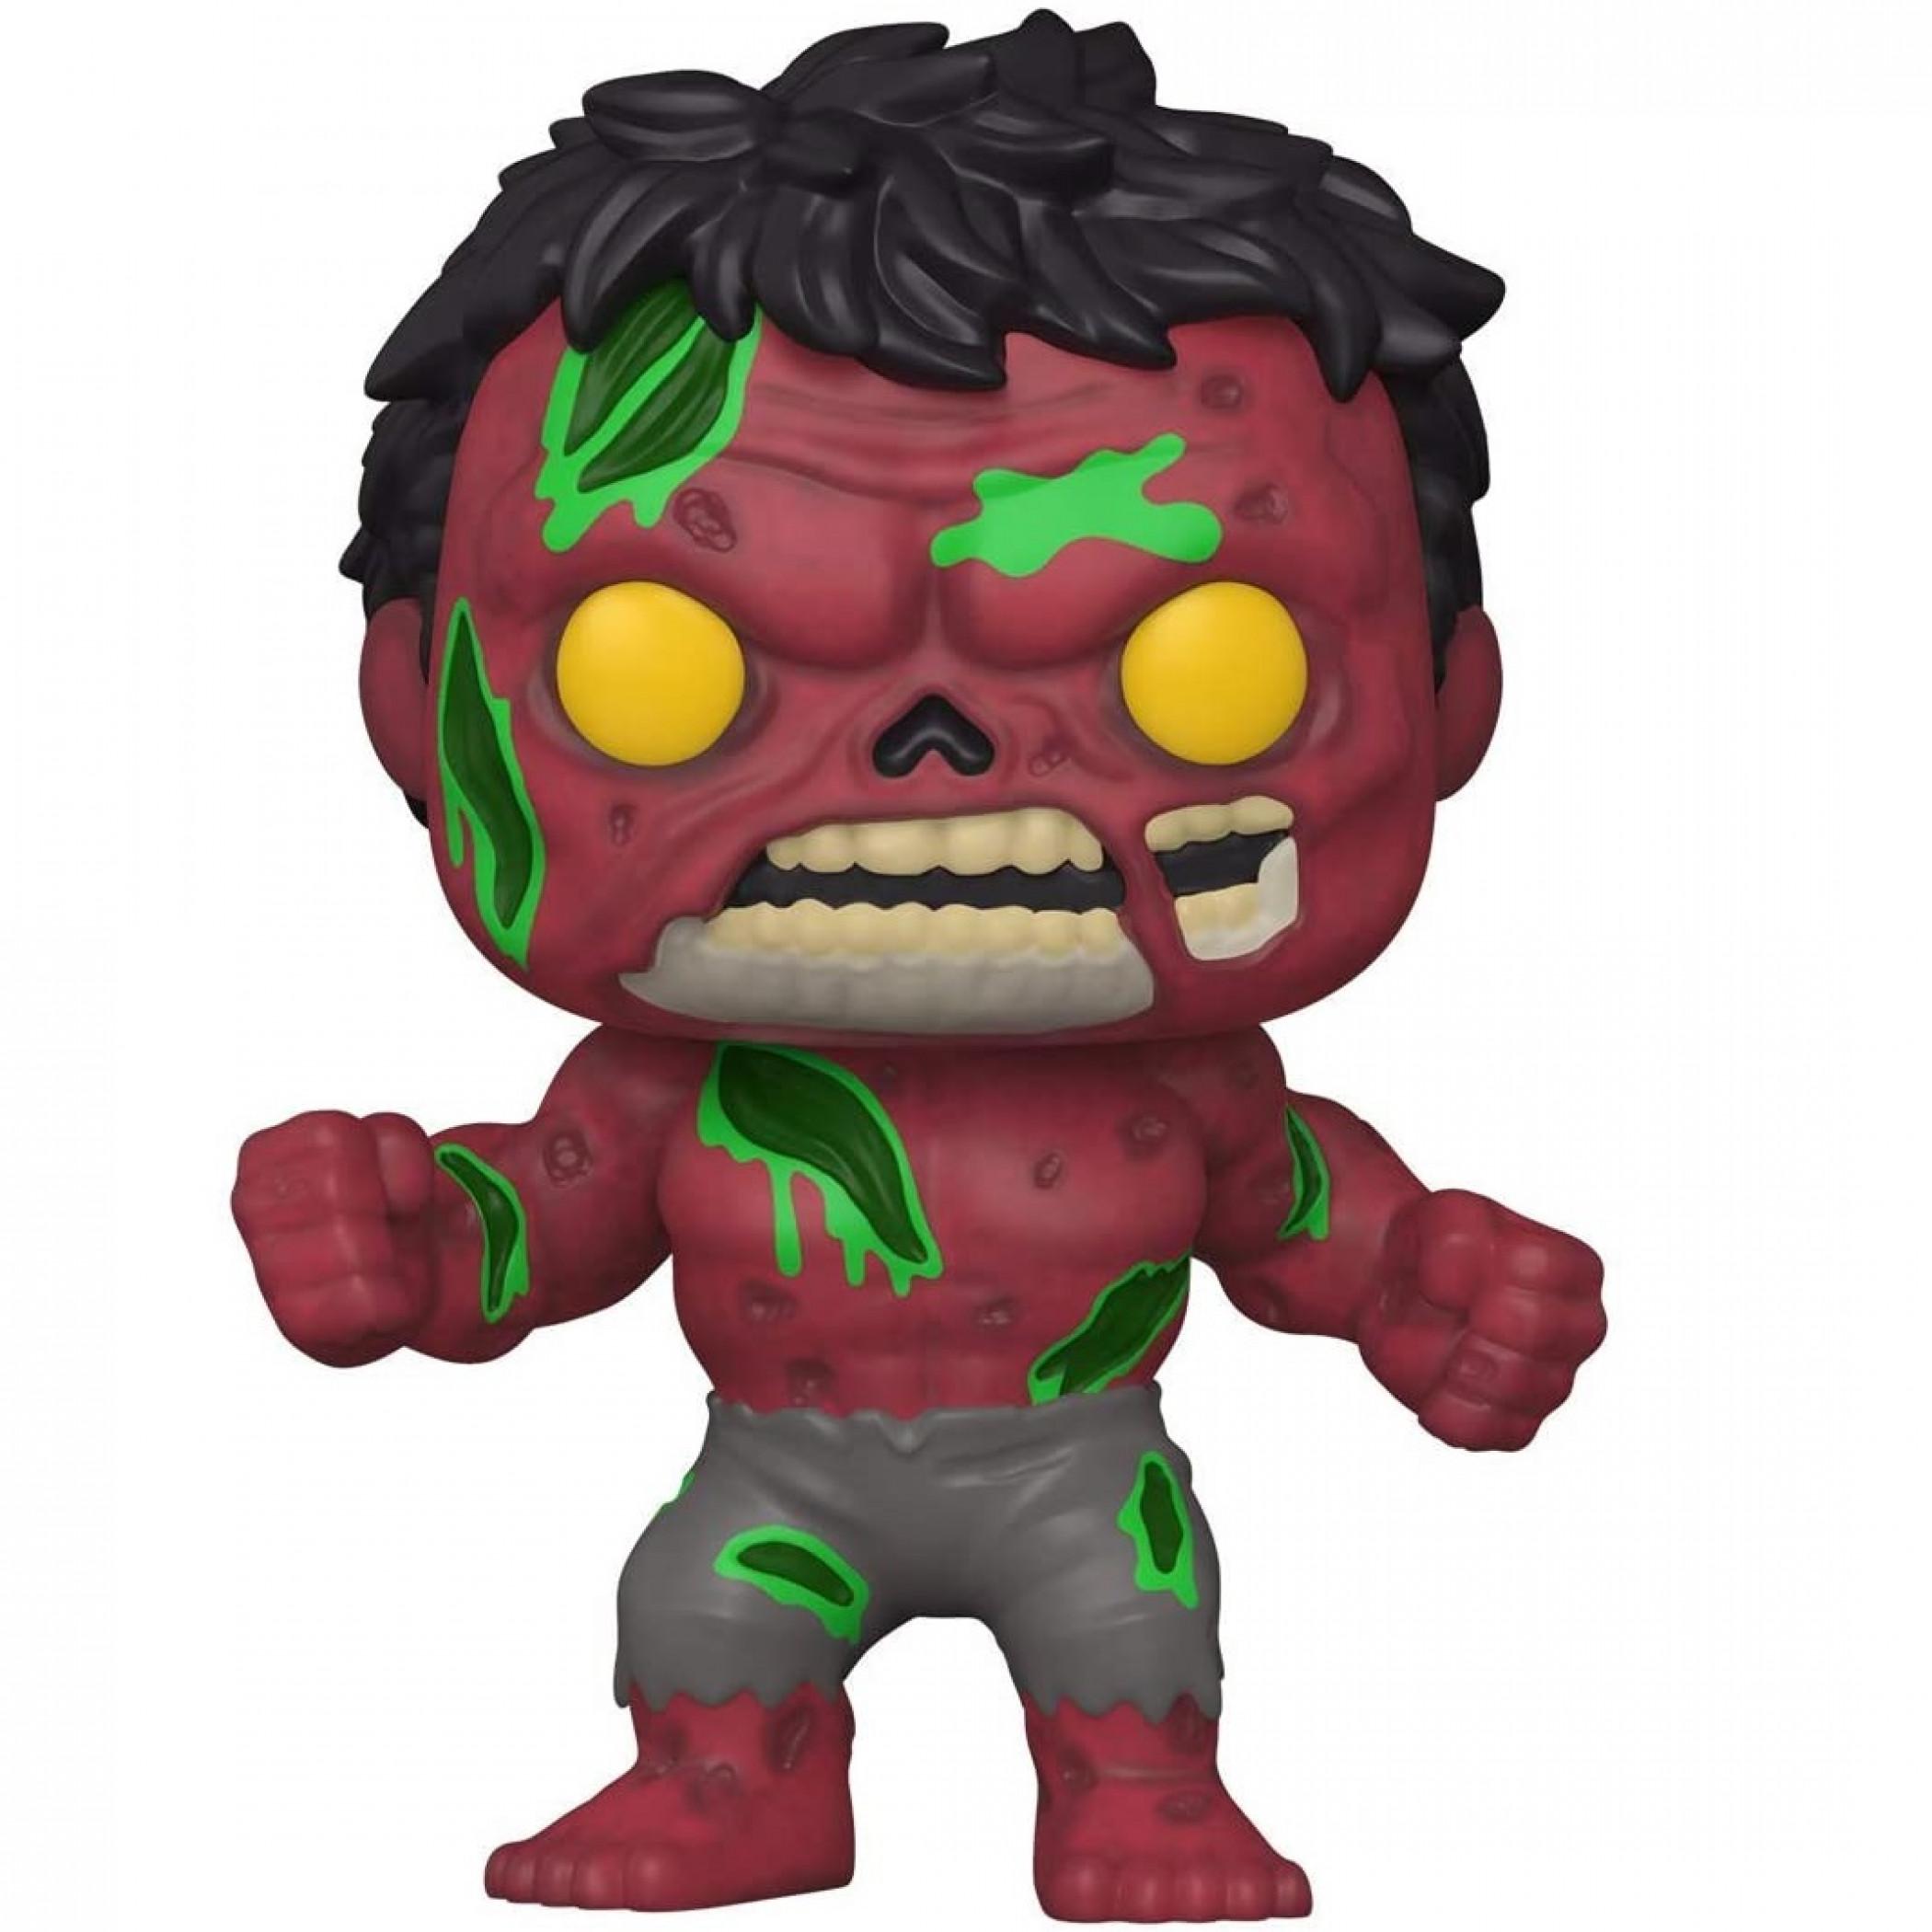 Marvel Zombies Red Hulk Funko Pop! Vinyl Figure